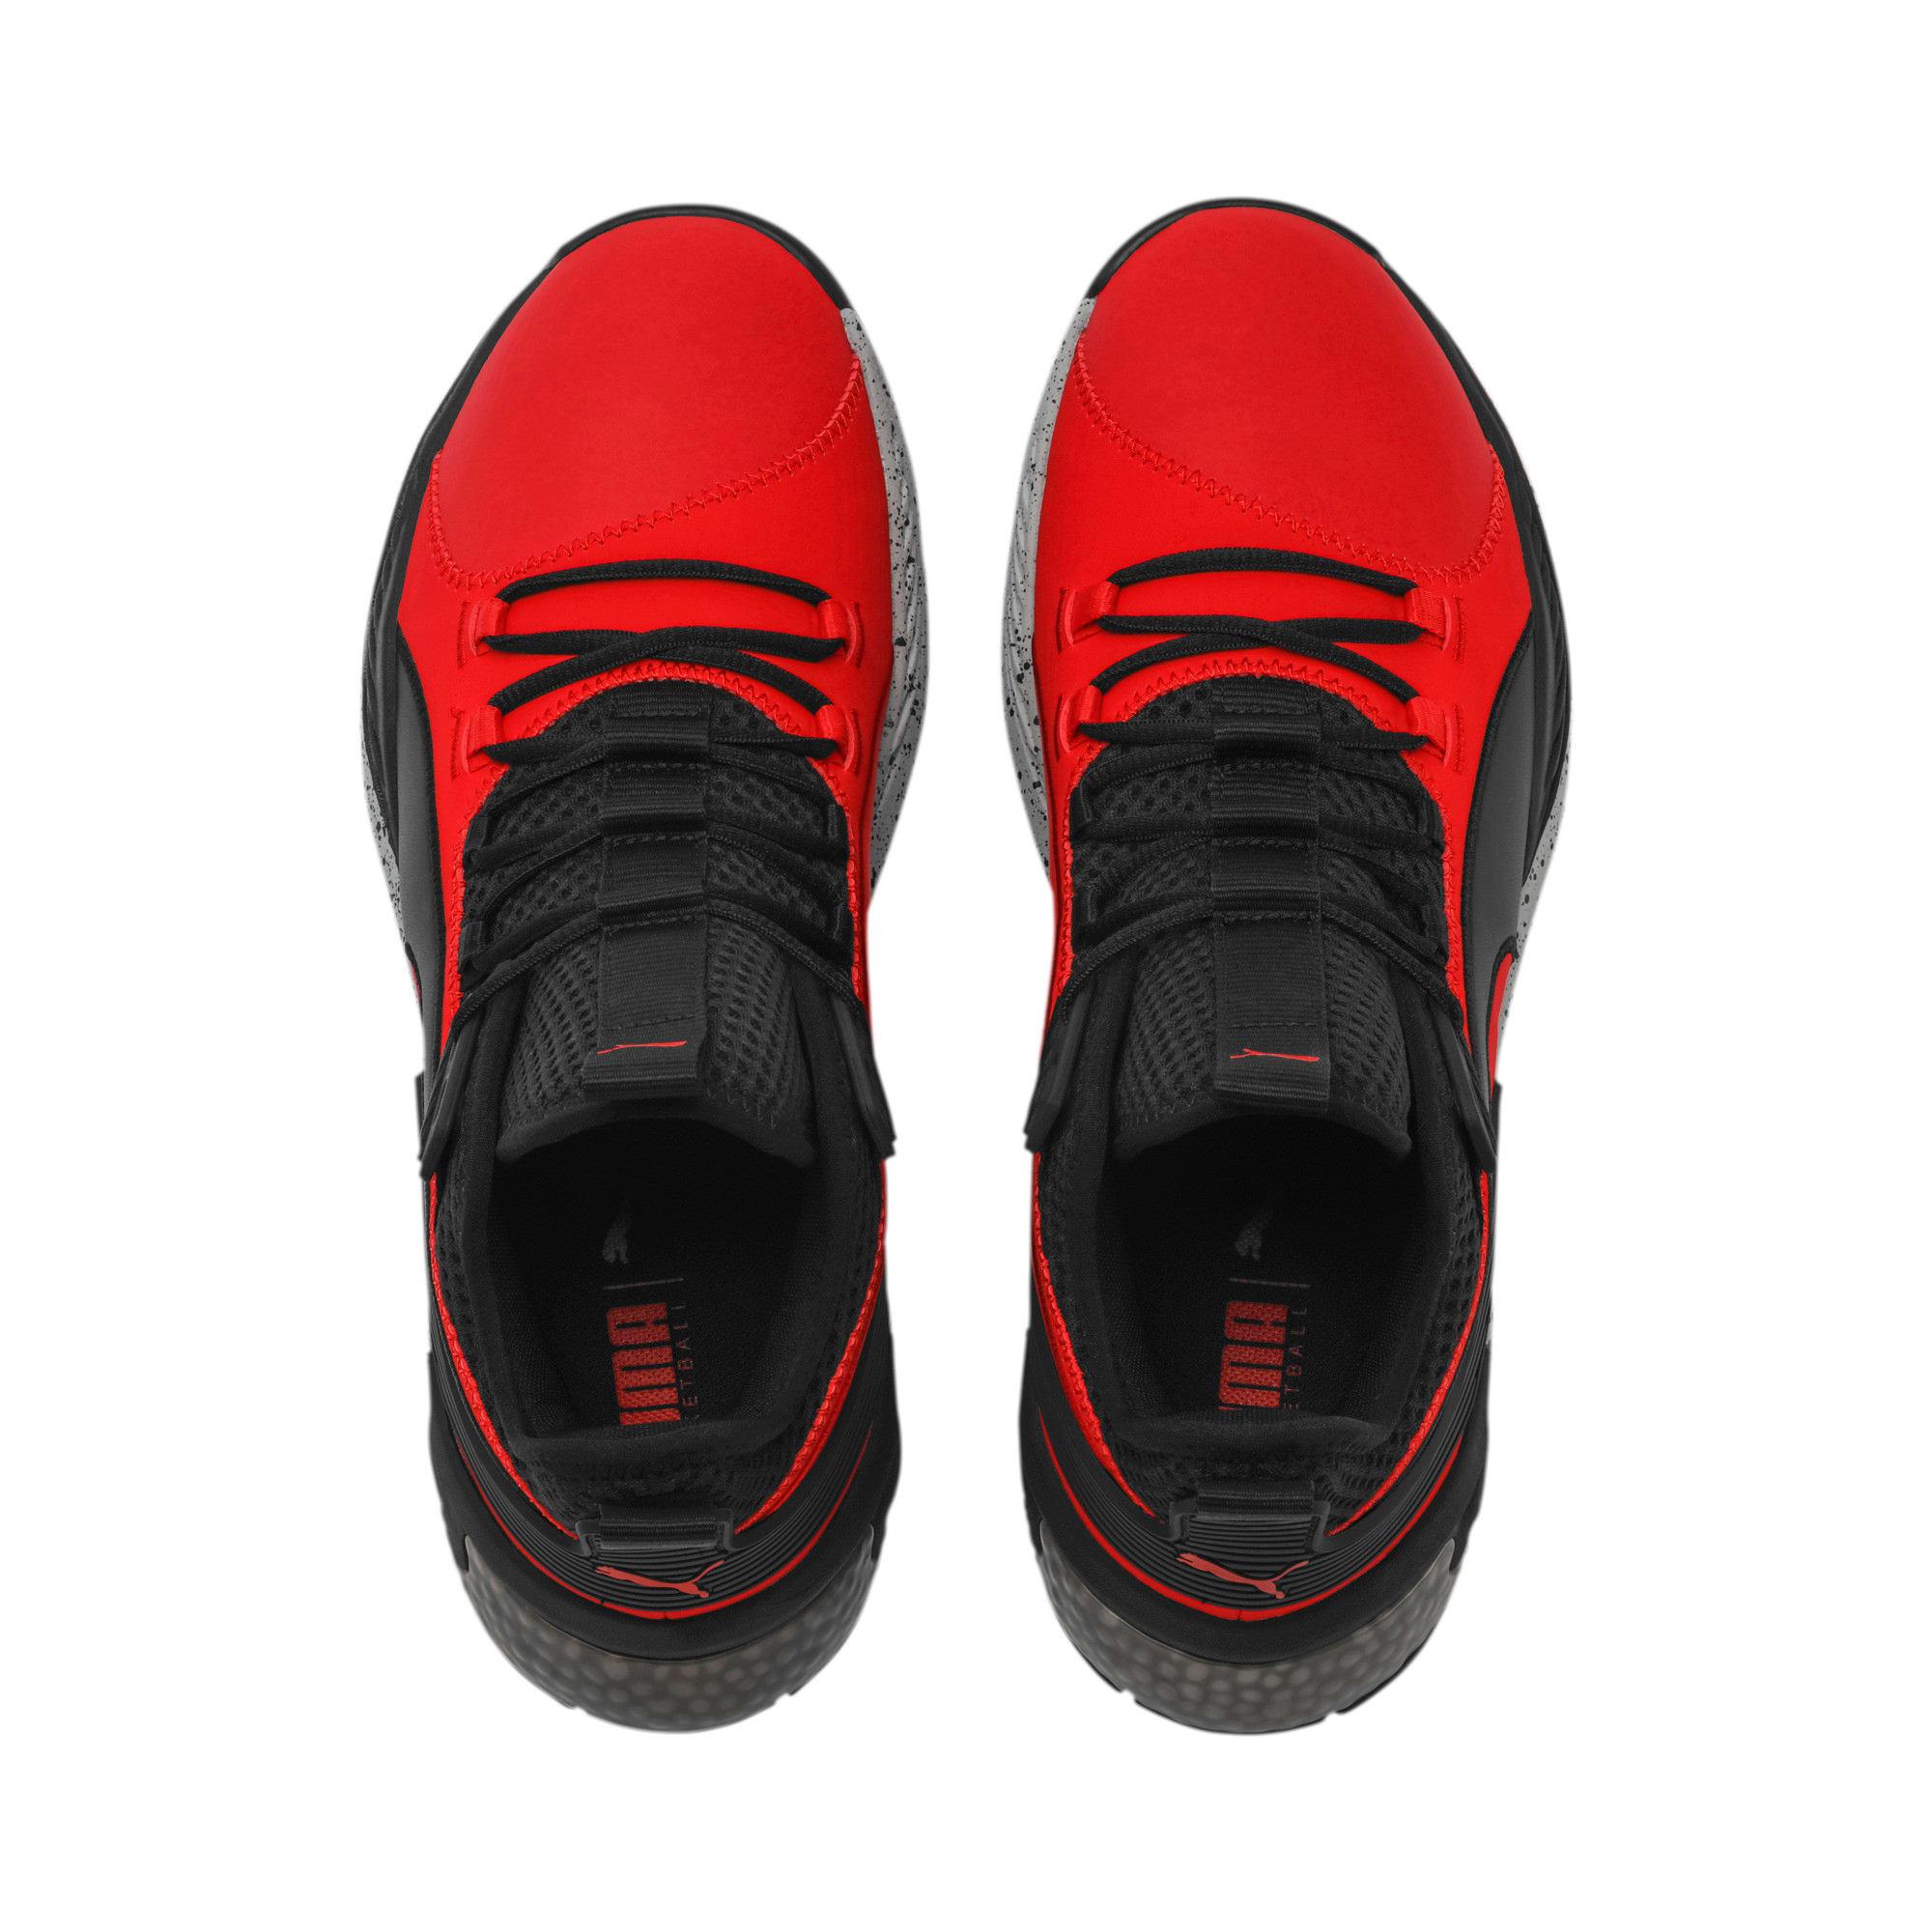 Thumbnail 6 of Uproar Core Men's Basketball Shoes, High Risk Red-Puma Black, medium